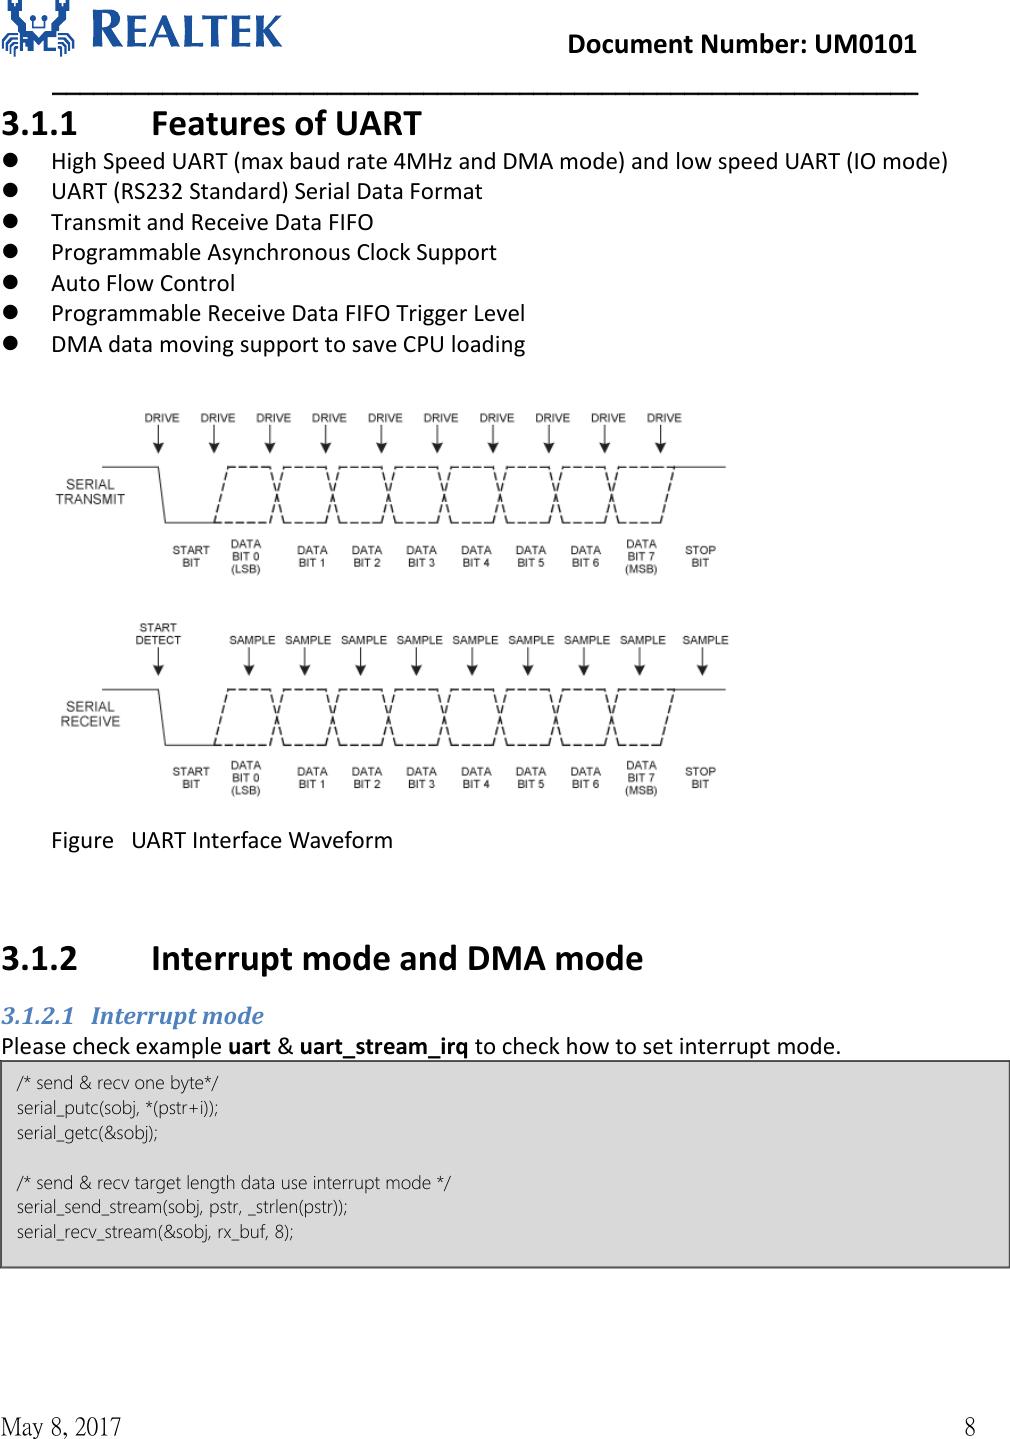 NFC Control UM0101 Realtek Ameba 1 Peripheral Developerment User Manual